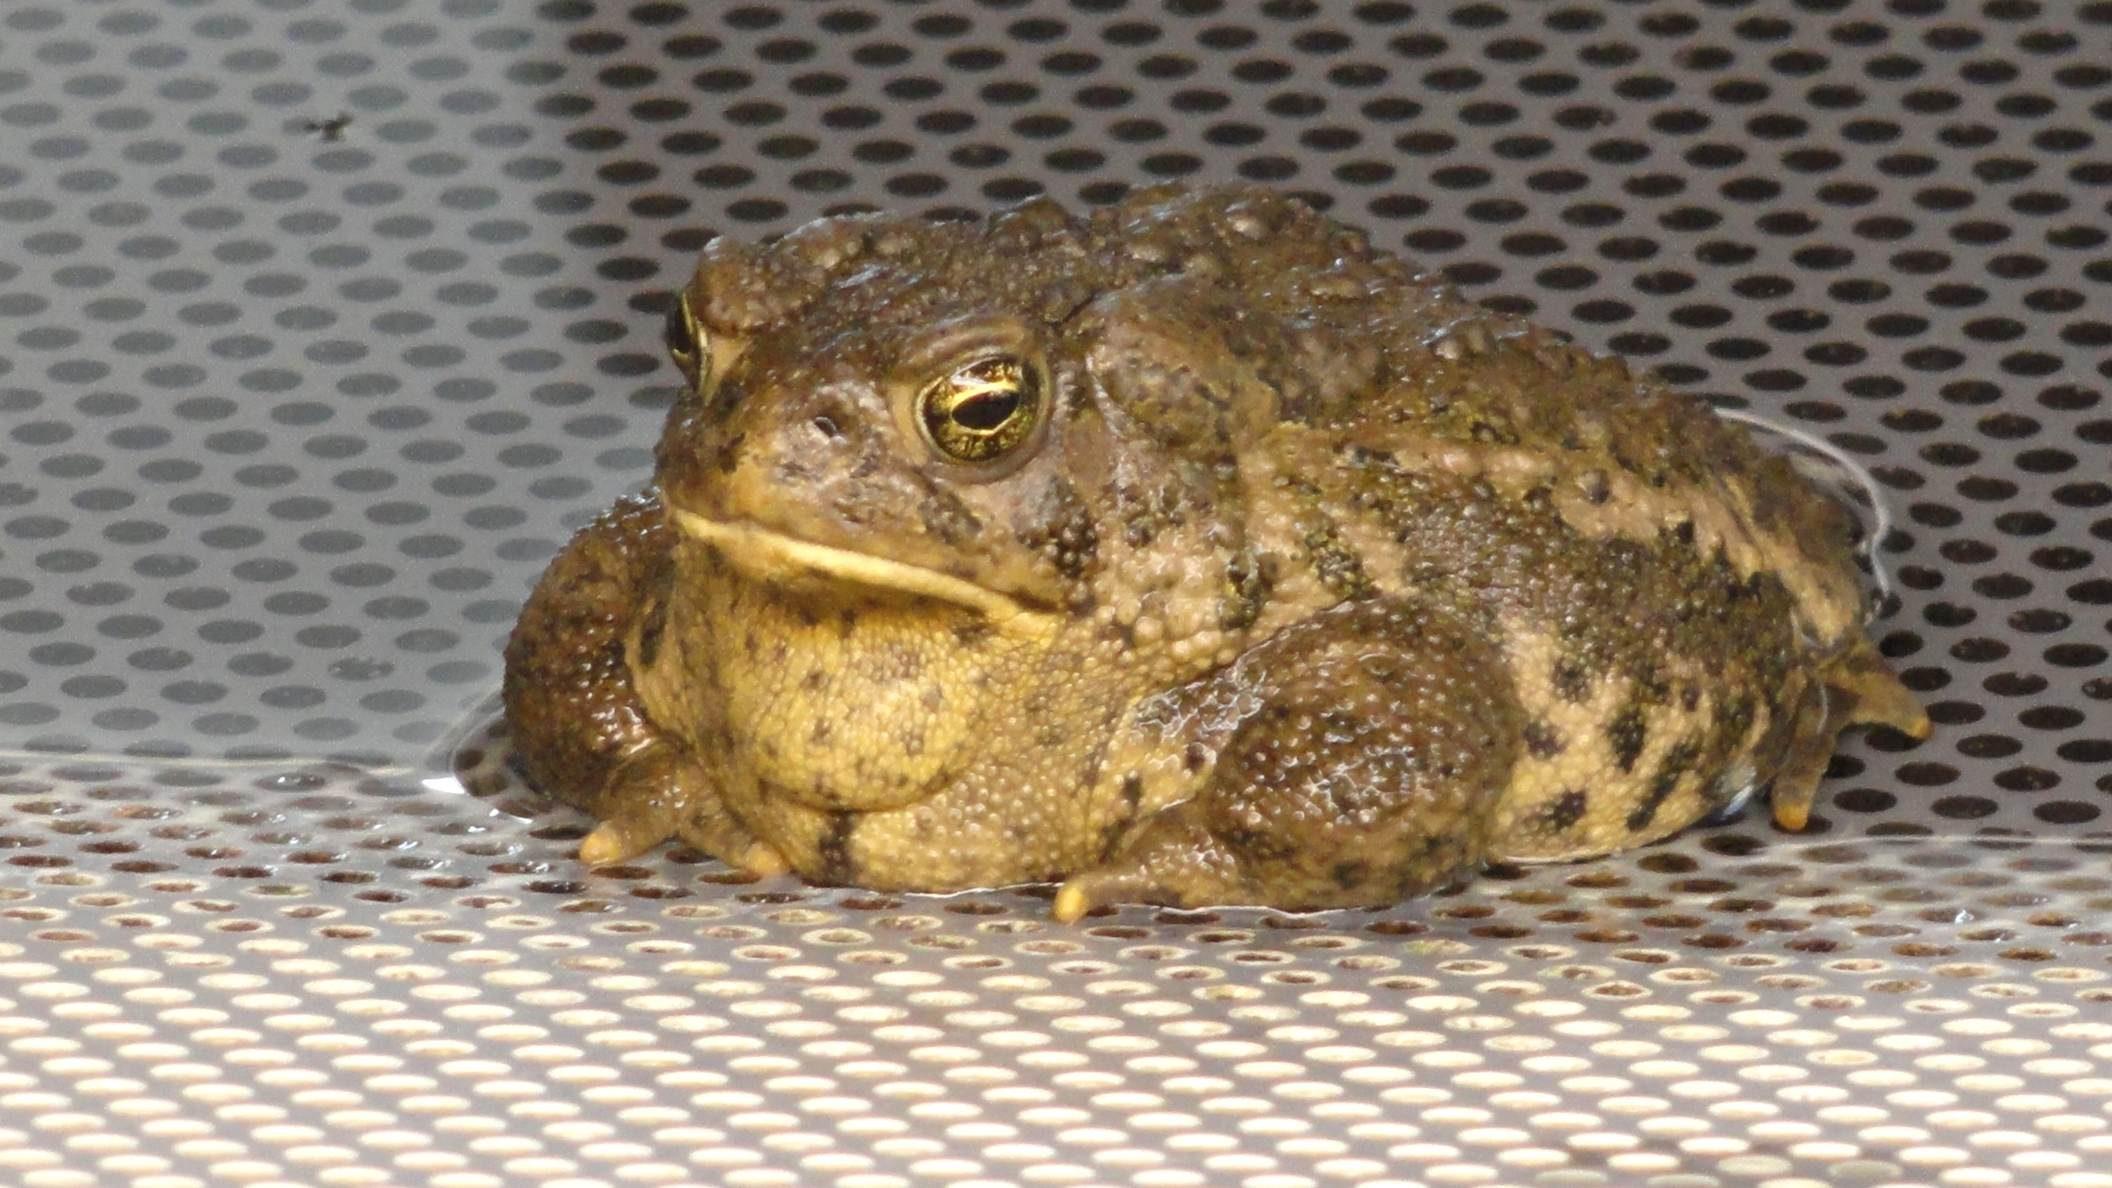 Free photograph; wyoming, toad, yellowish, frog, amphibian, animal